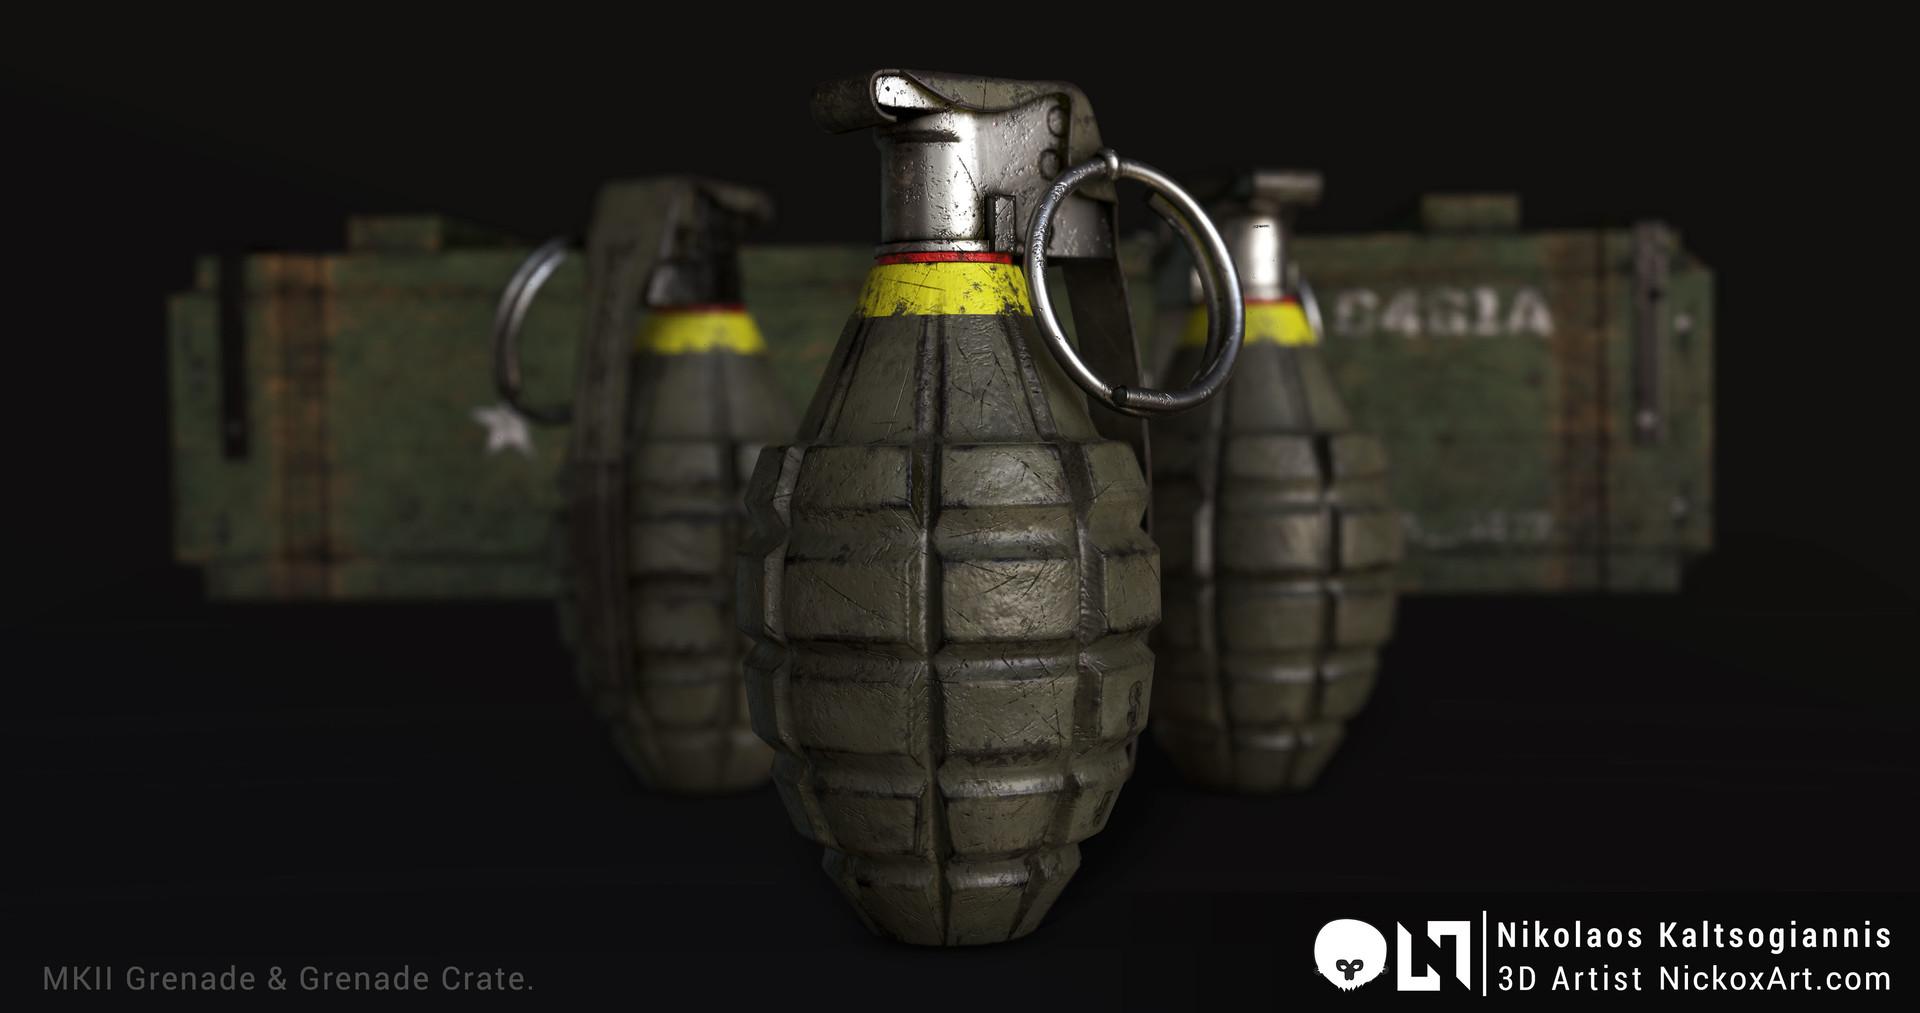 Nikolaos kaltsogiannis mk2 grenade presentation 05w text